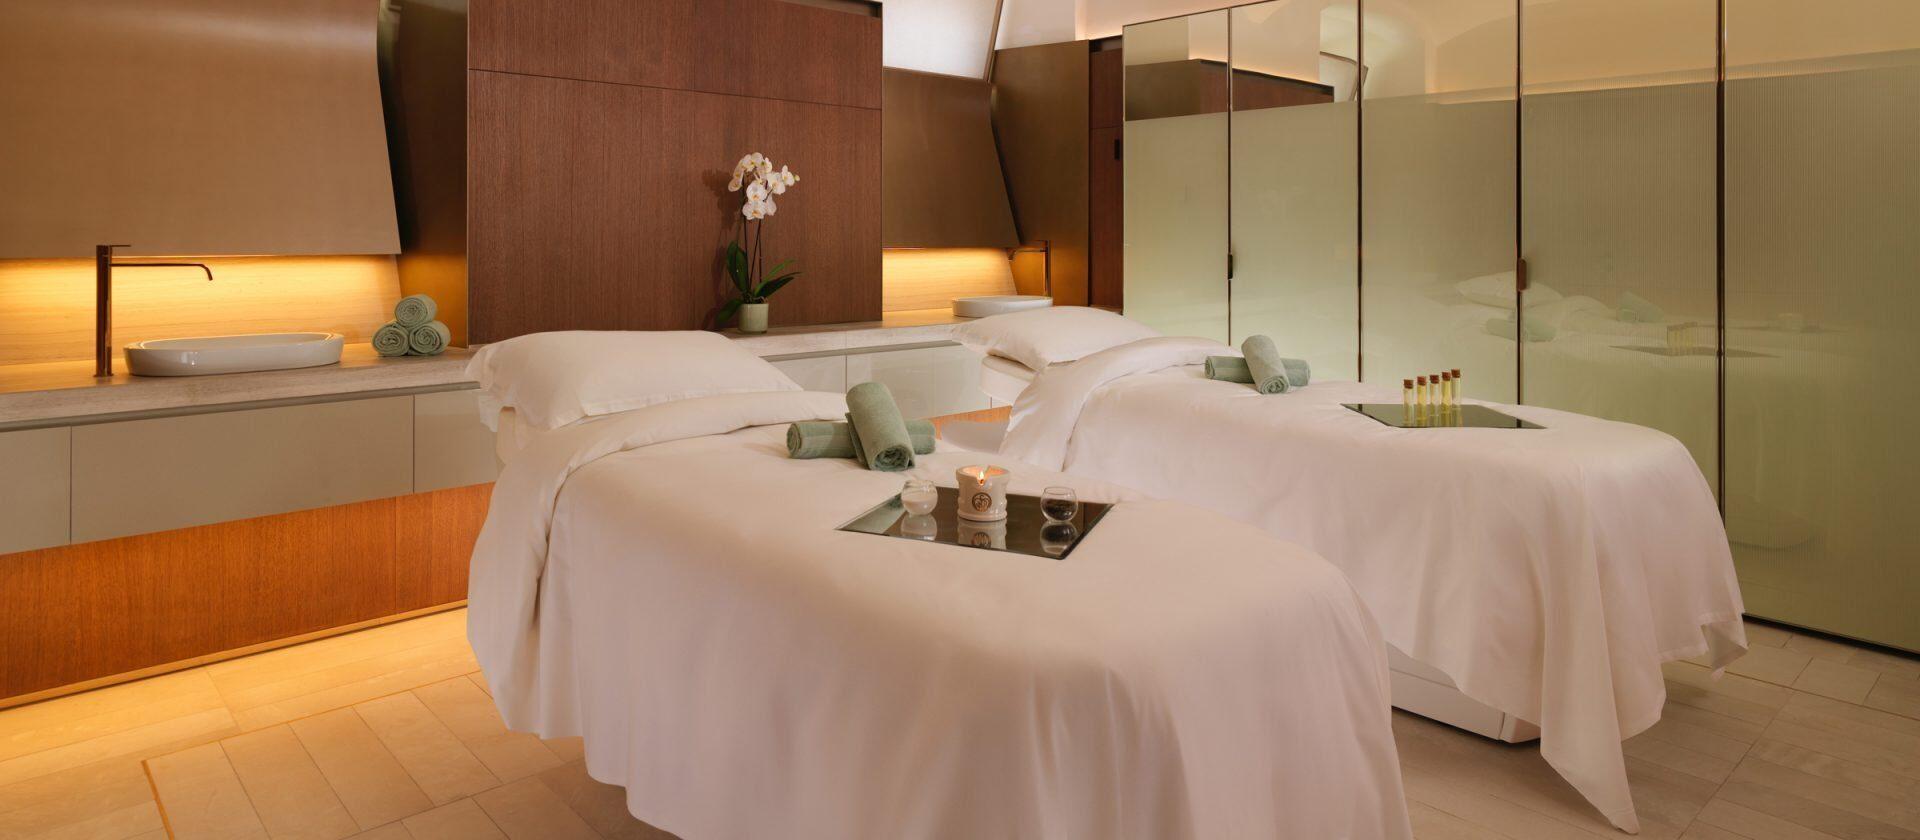 07c306fa833 Spa treatments. Contact. Facial  Massage  Osteopathy  Body ...